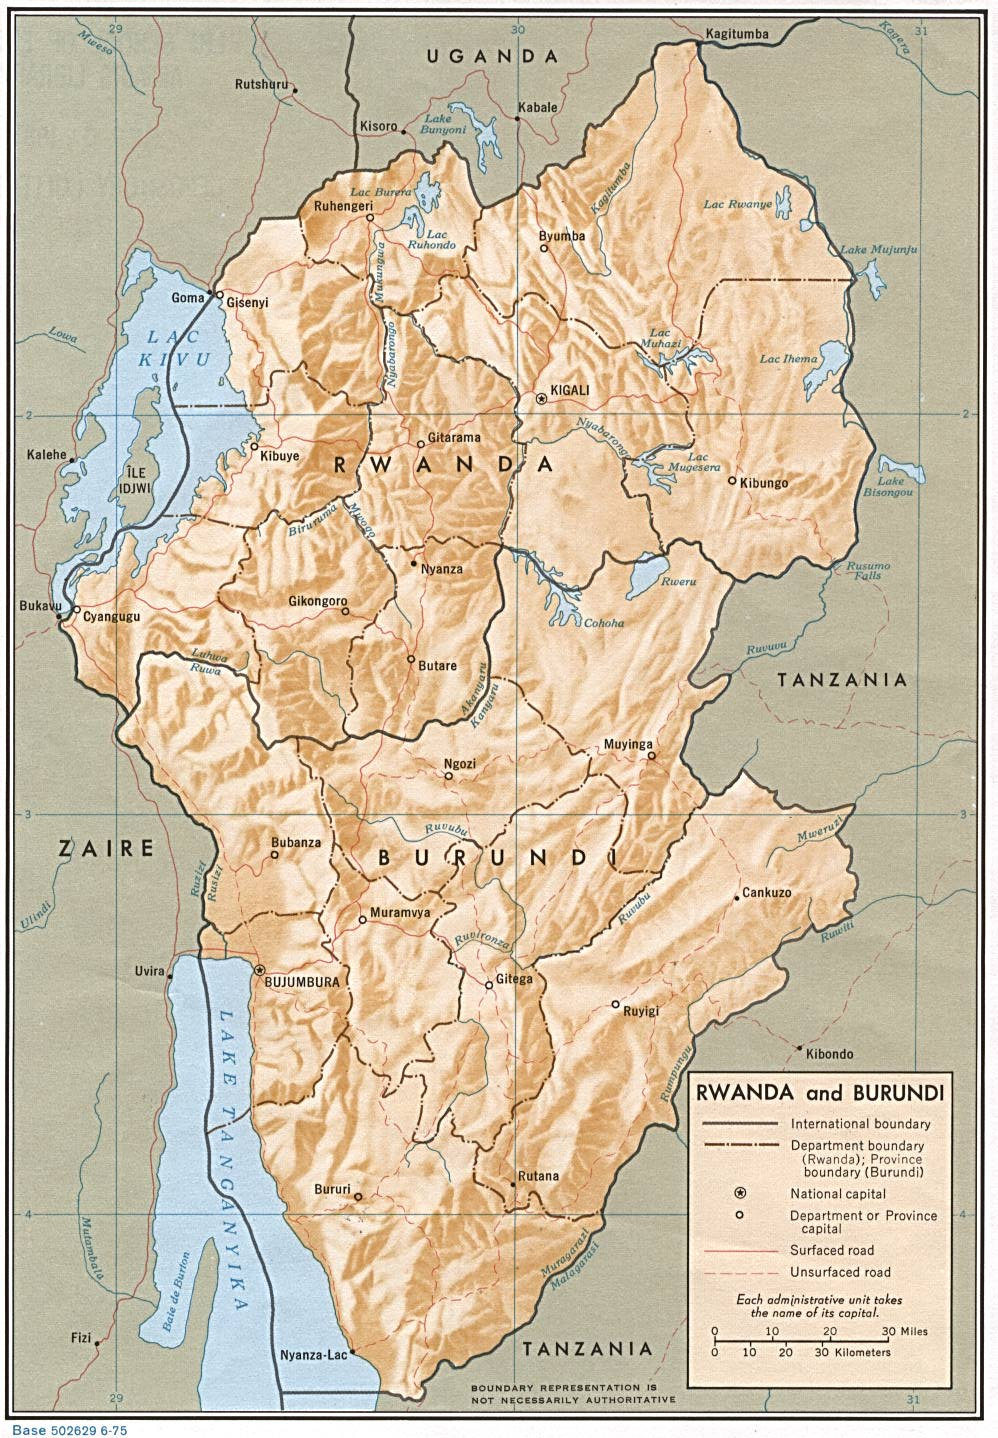 Rwanda Maps PerryCastañeda Map Collection UT Library Online - Rwanda map